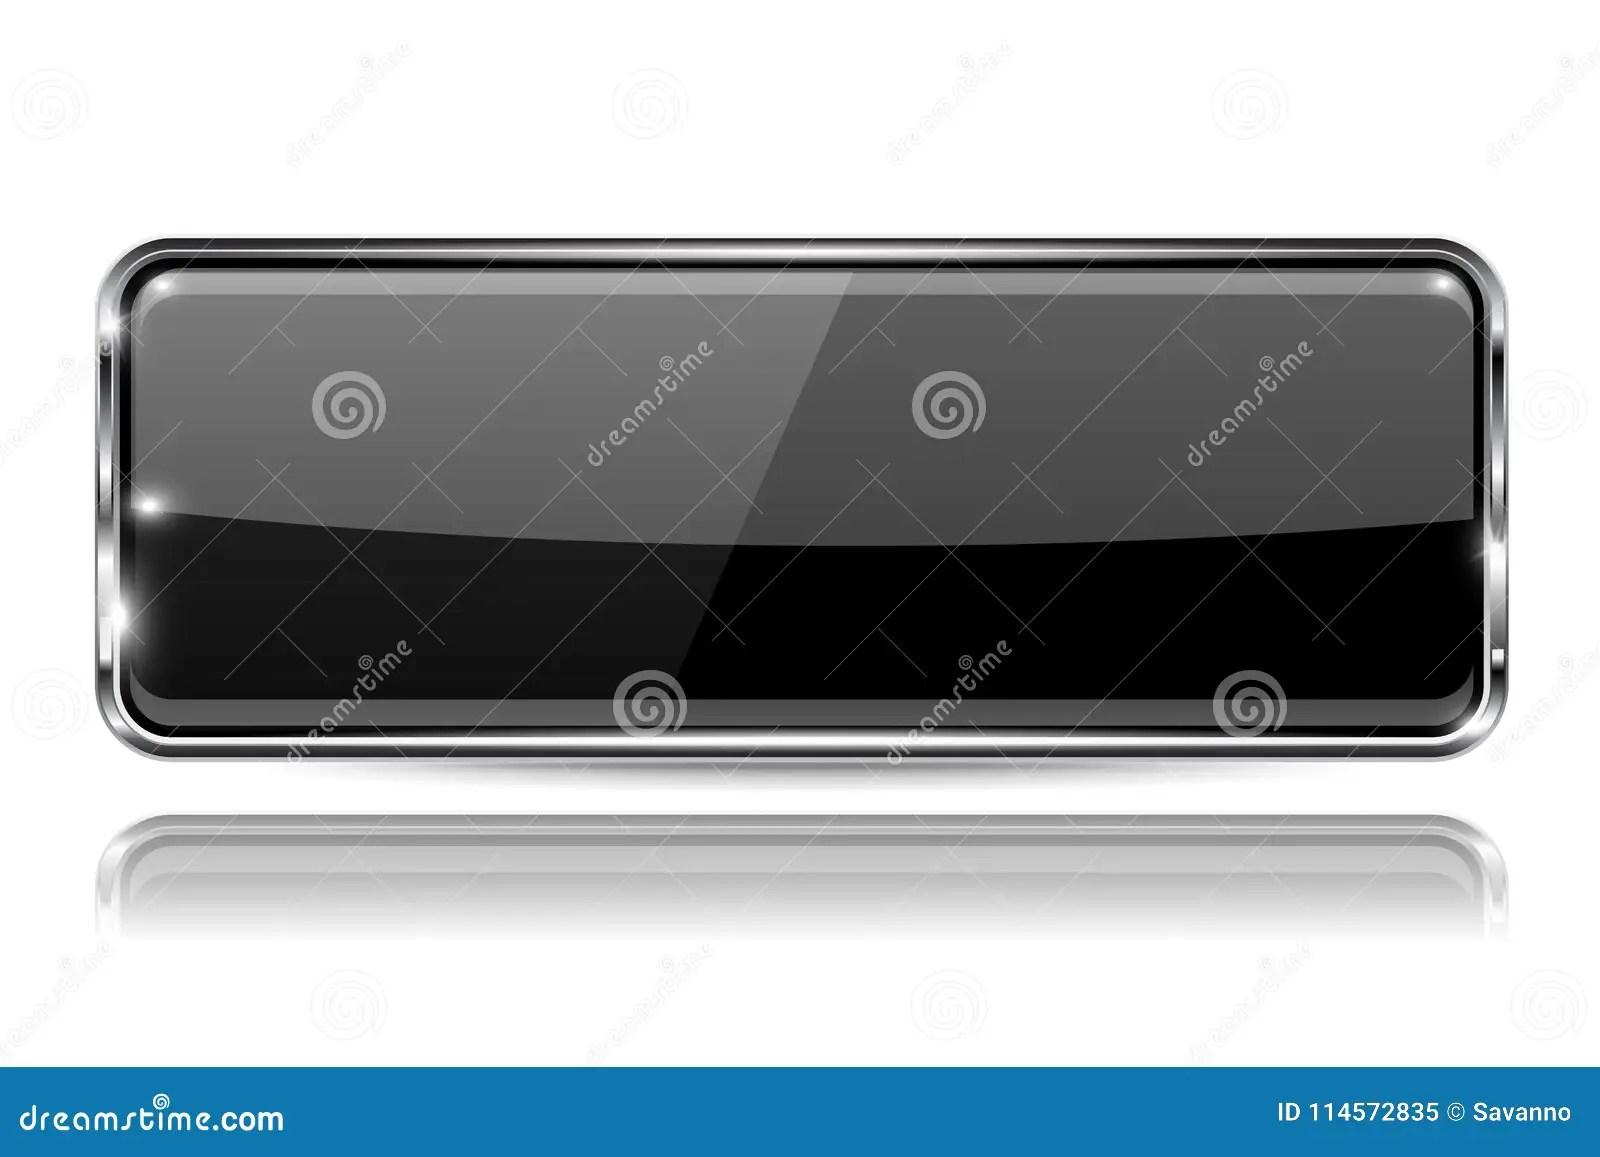 framed prints for kitchens polished brass kitchen faucets 有金属框架的黑玻璃3d按钮长方形形状在白色背景的反射向量例证 插画包括 有金属框架的黑玻璃3d按钮长方形形状在白色背景的反射